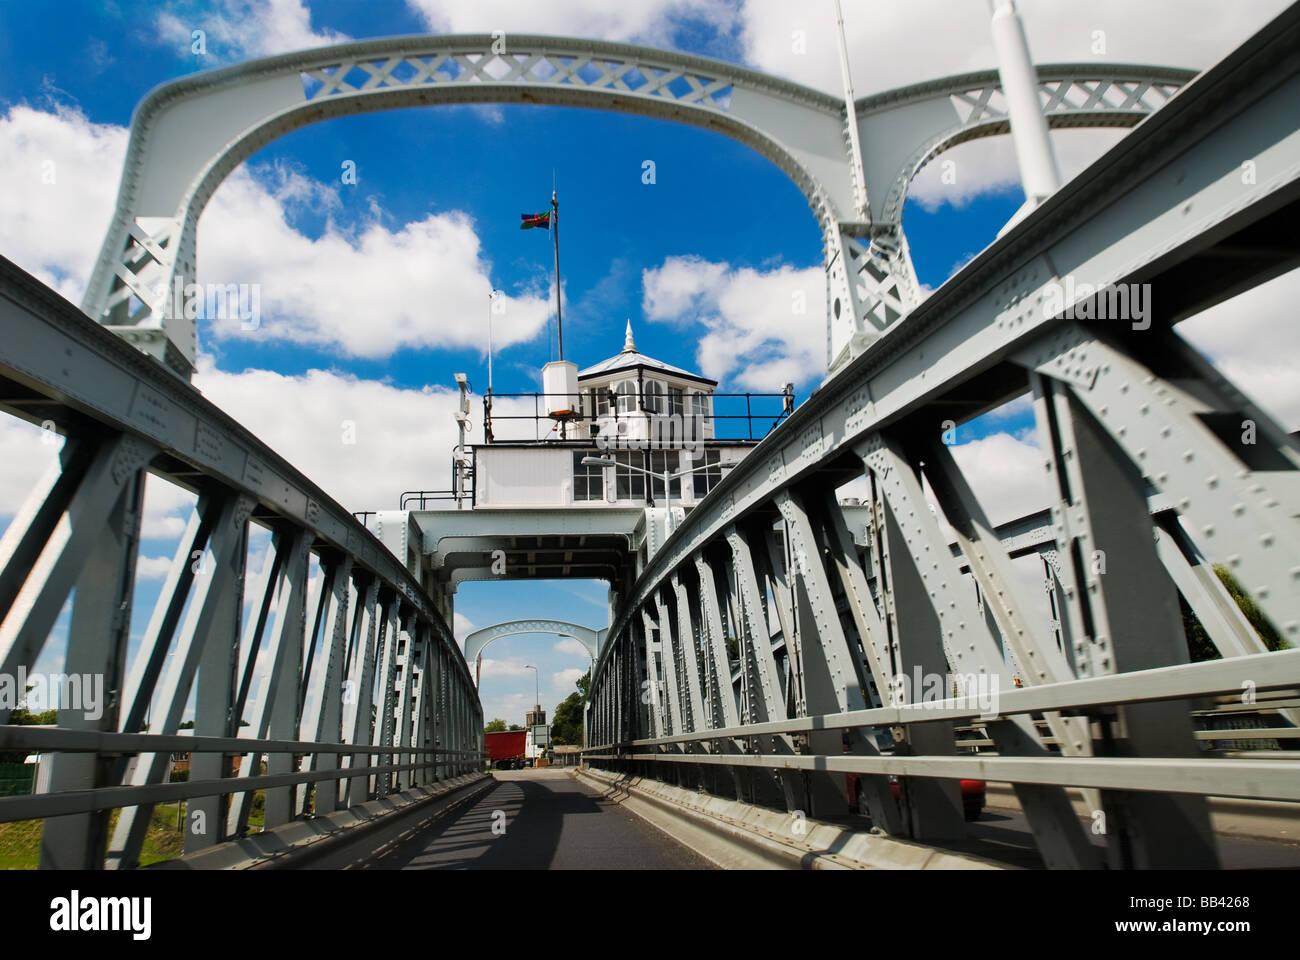 photograph of Sutton road bridge over the river Nene - Stock Image